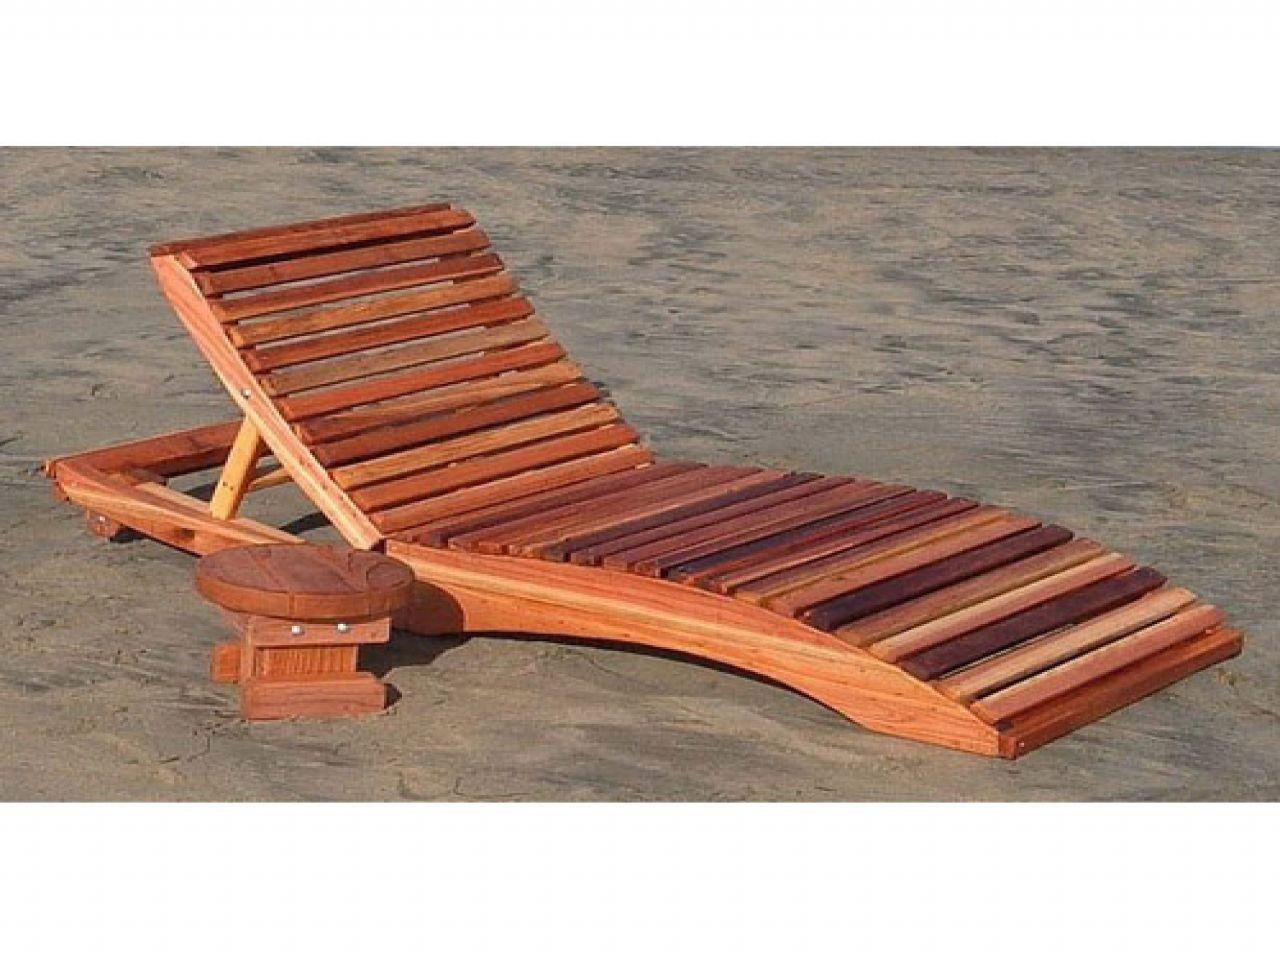 Chaise Lounge Plans Woodworkingdiyplan Woodworking Diy Wooden Deck